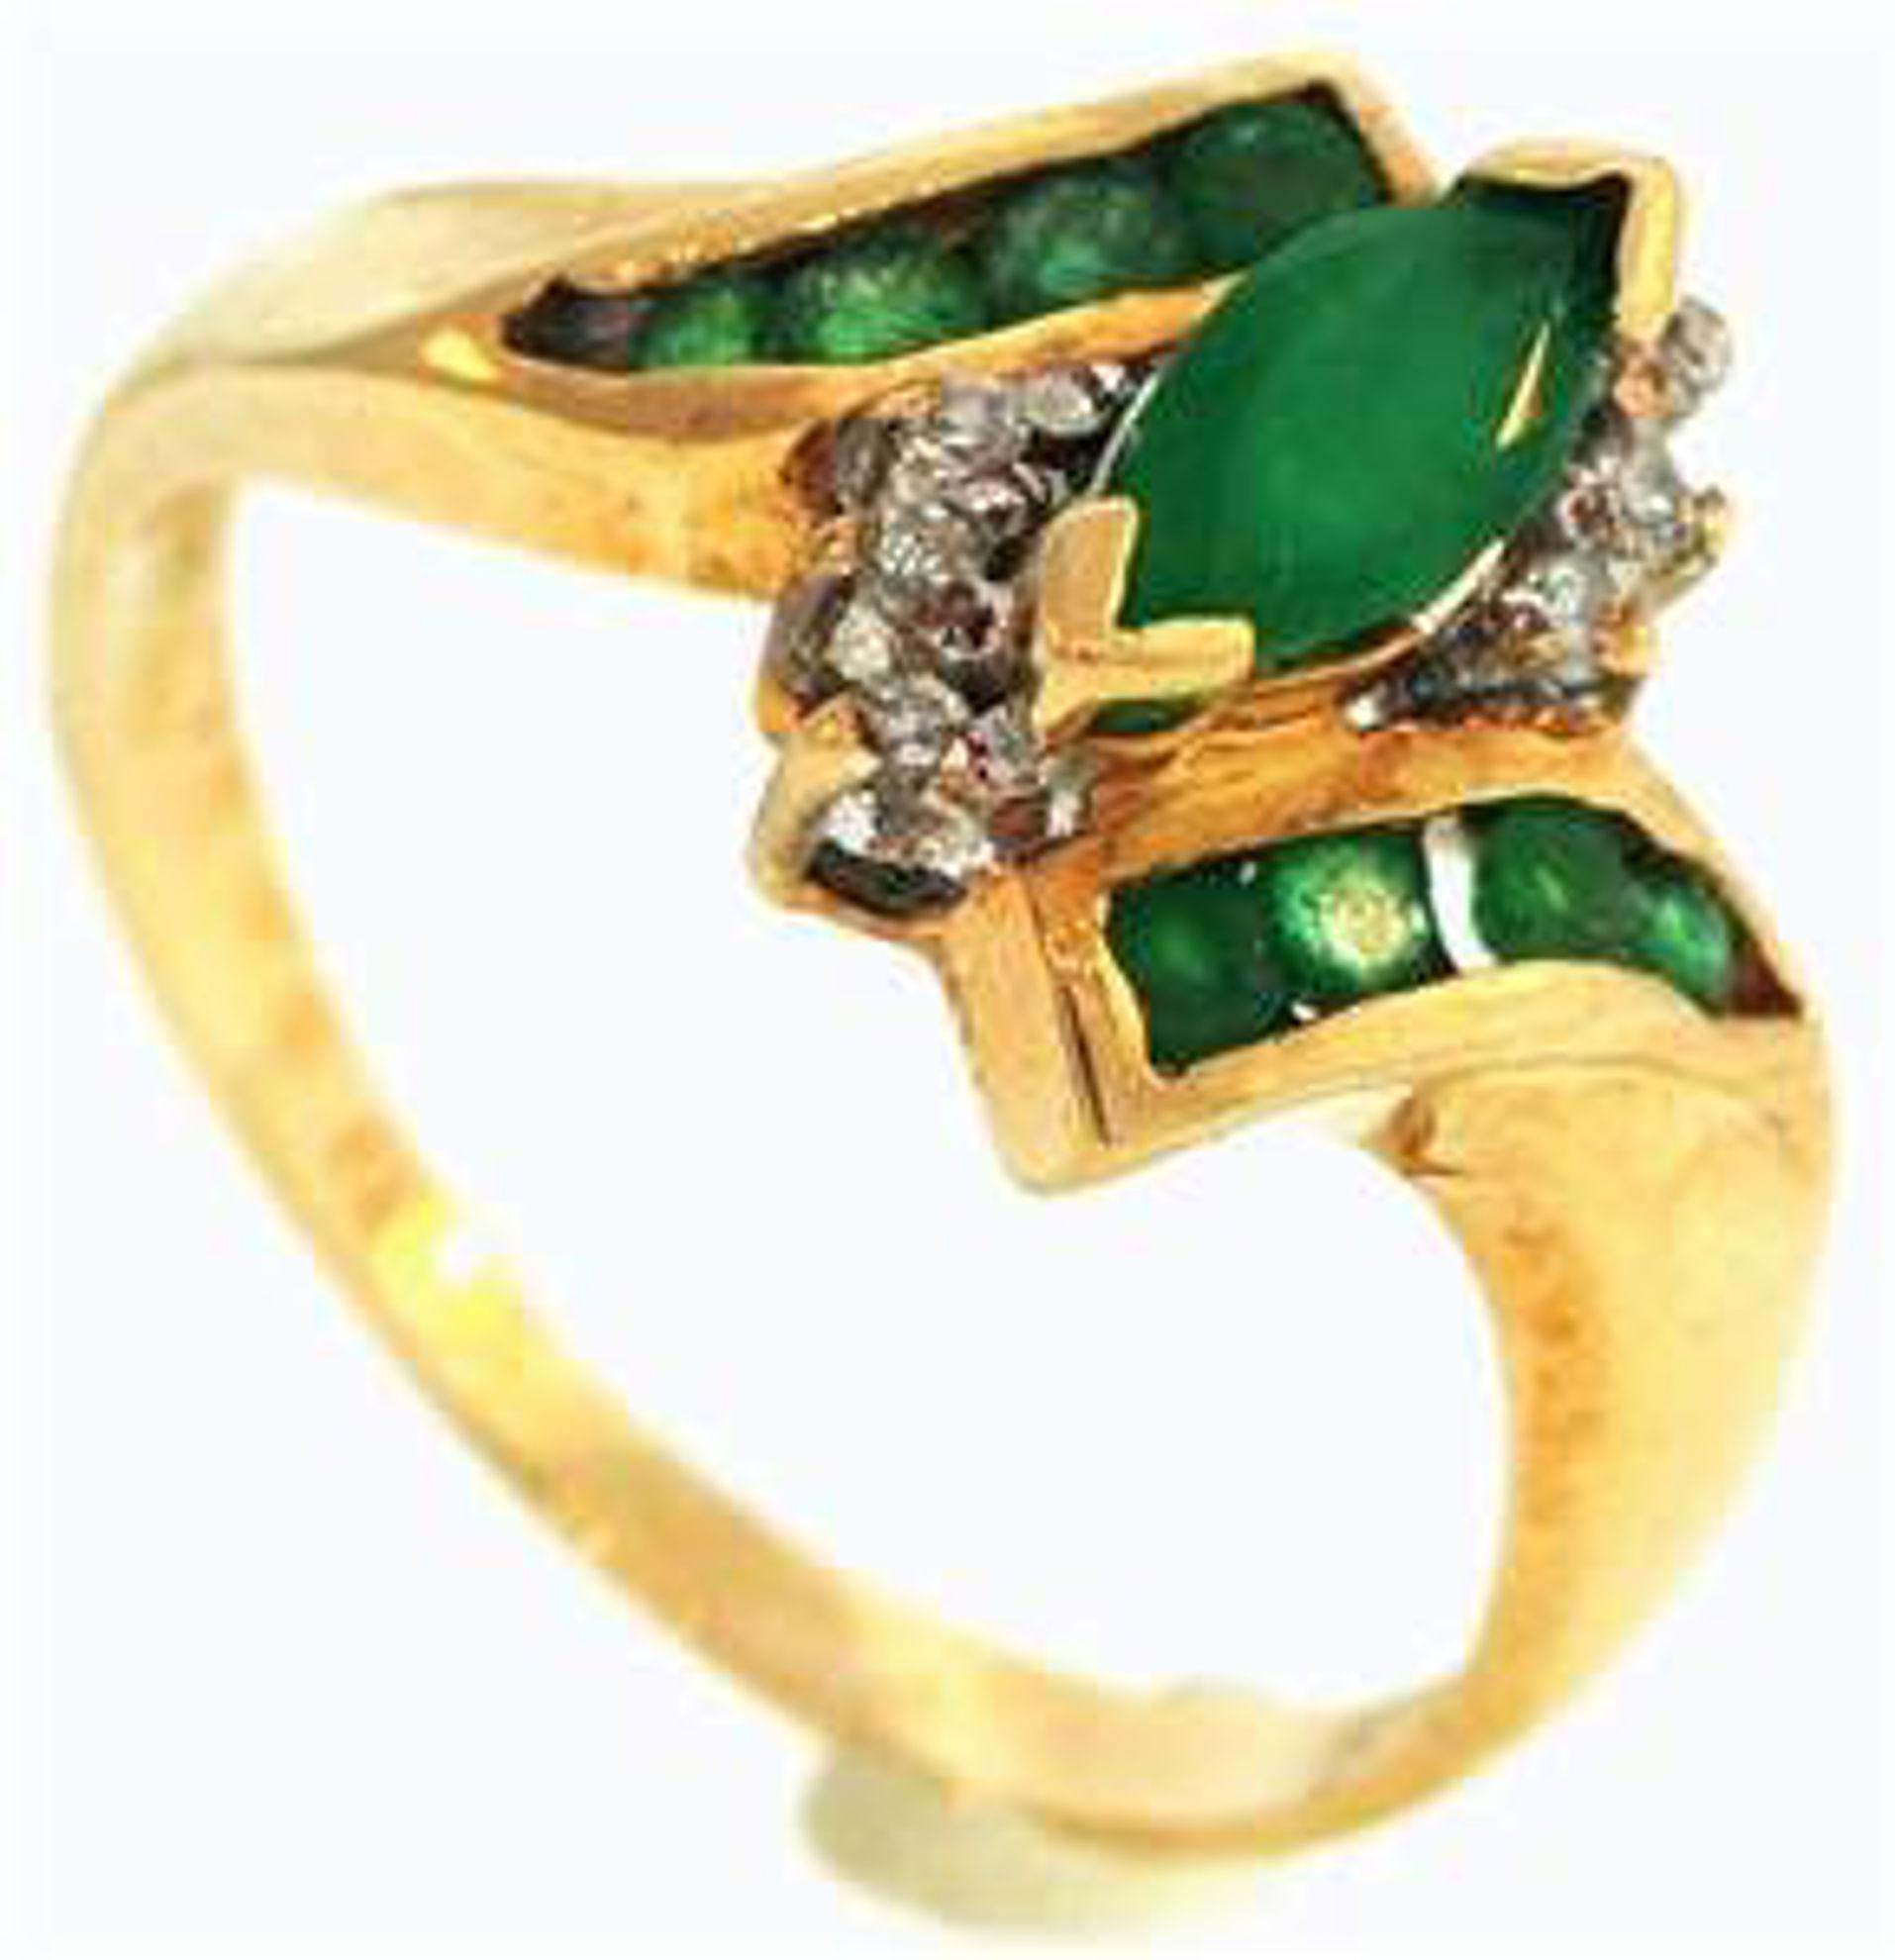 Picture of Ladies' Rings 10kt-1.6 DWT, 2.5 Grams